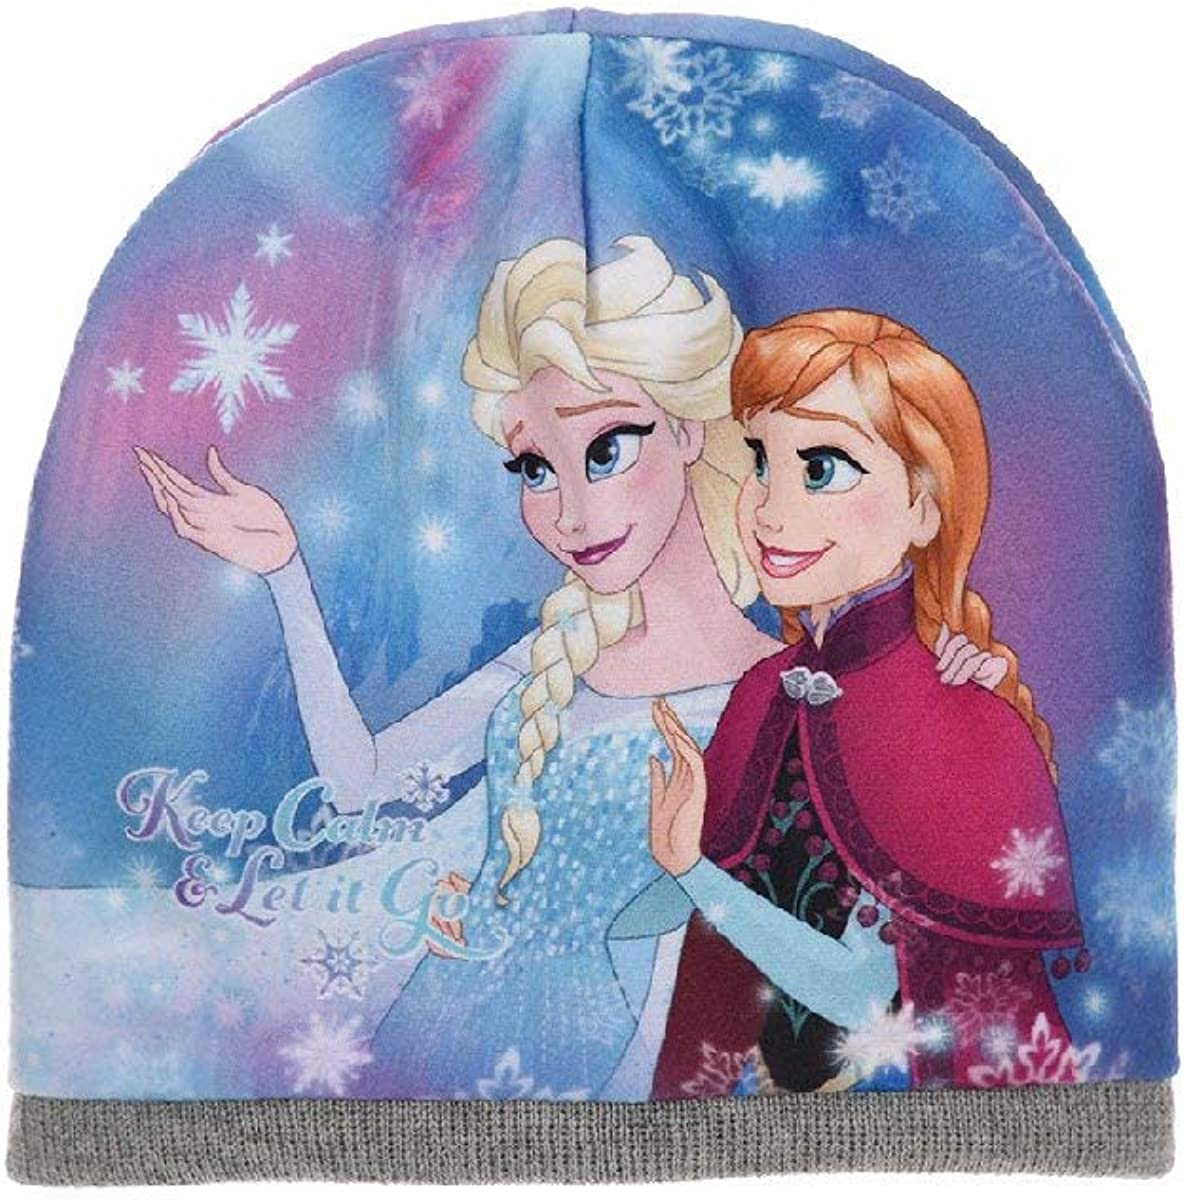 Disney Official Frozen Elsa /& Anna Knitted Hat or Hat /& Glove or Hat /& Scarf /& Glove Set